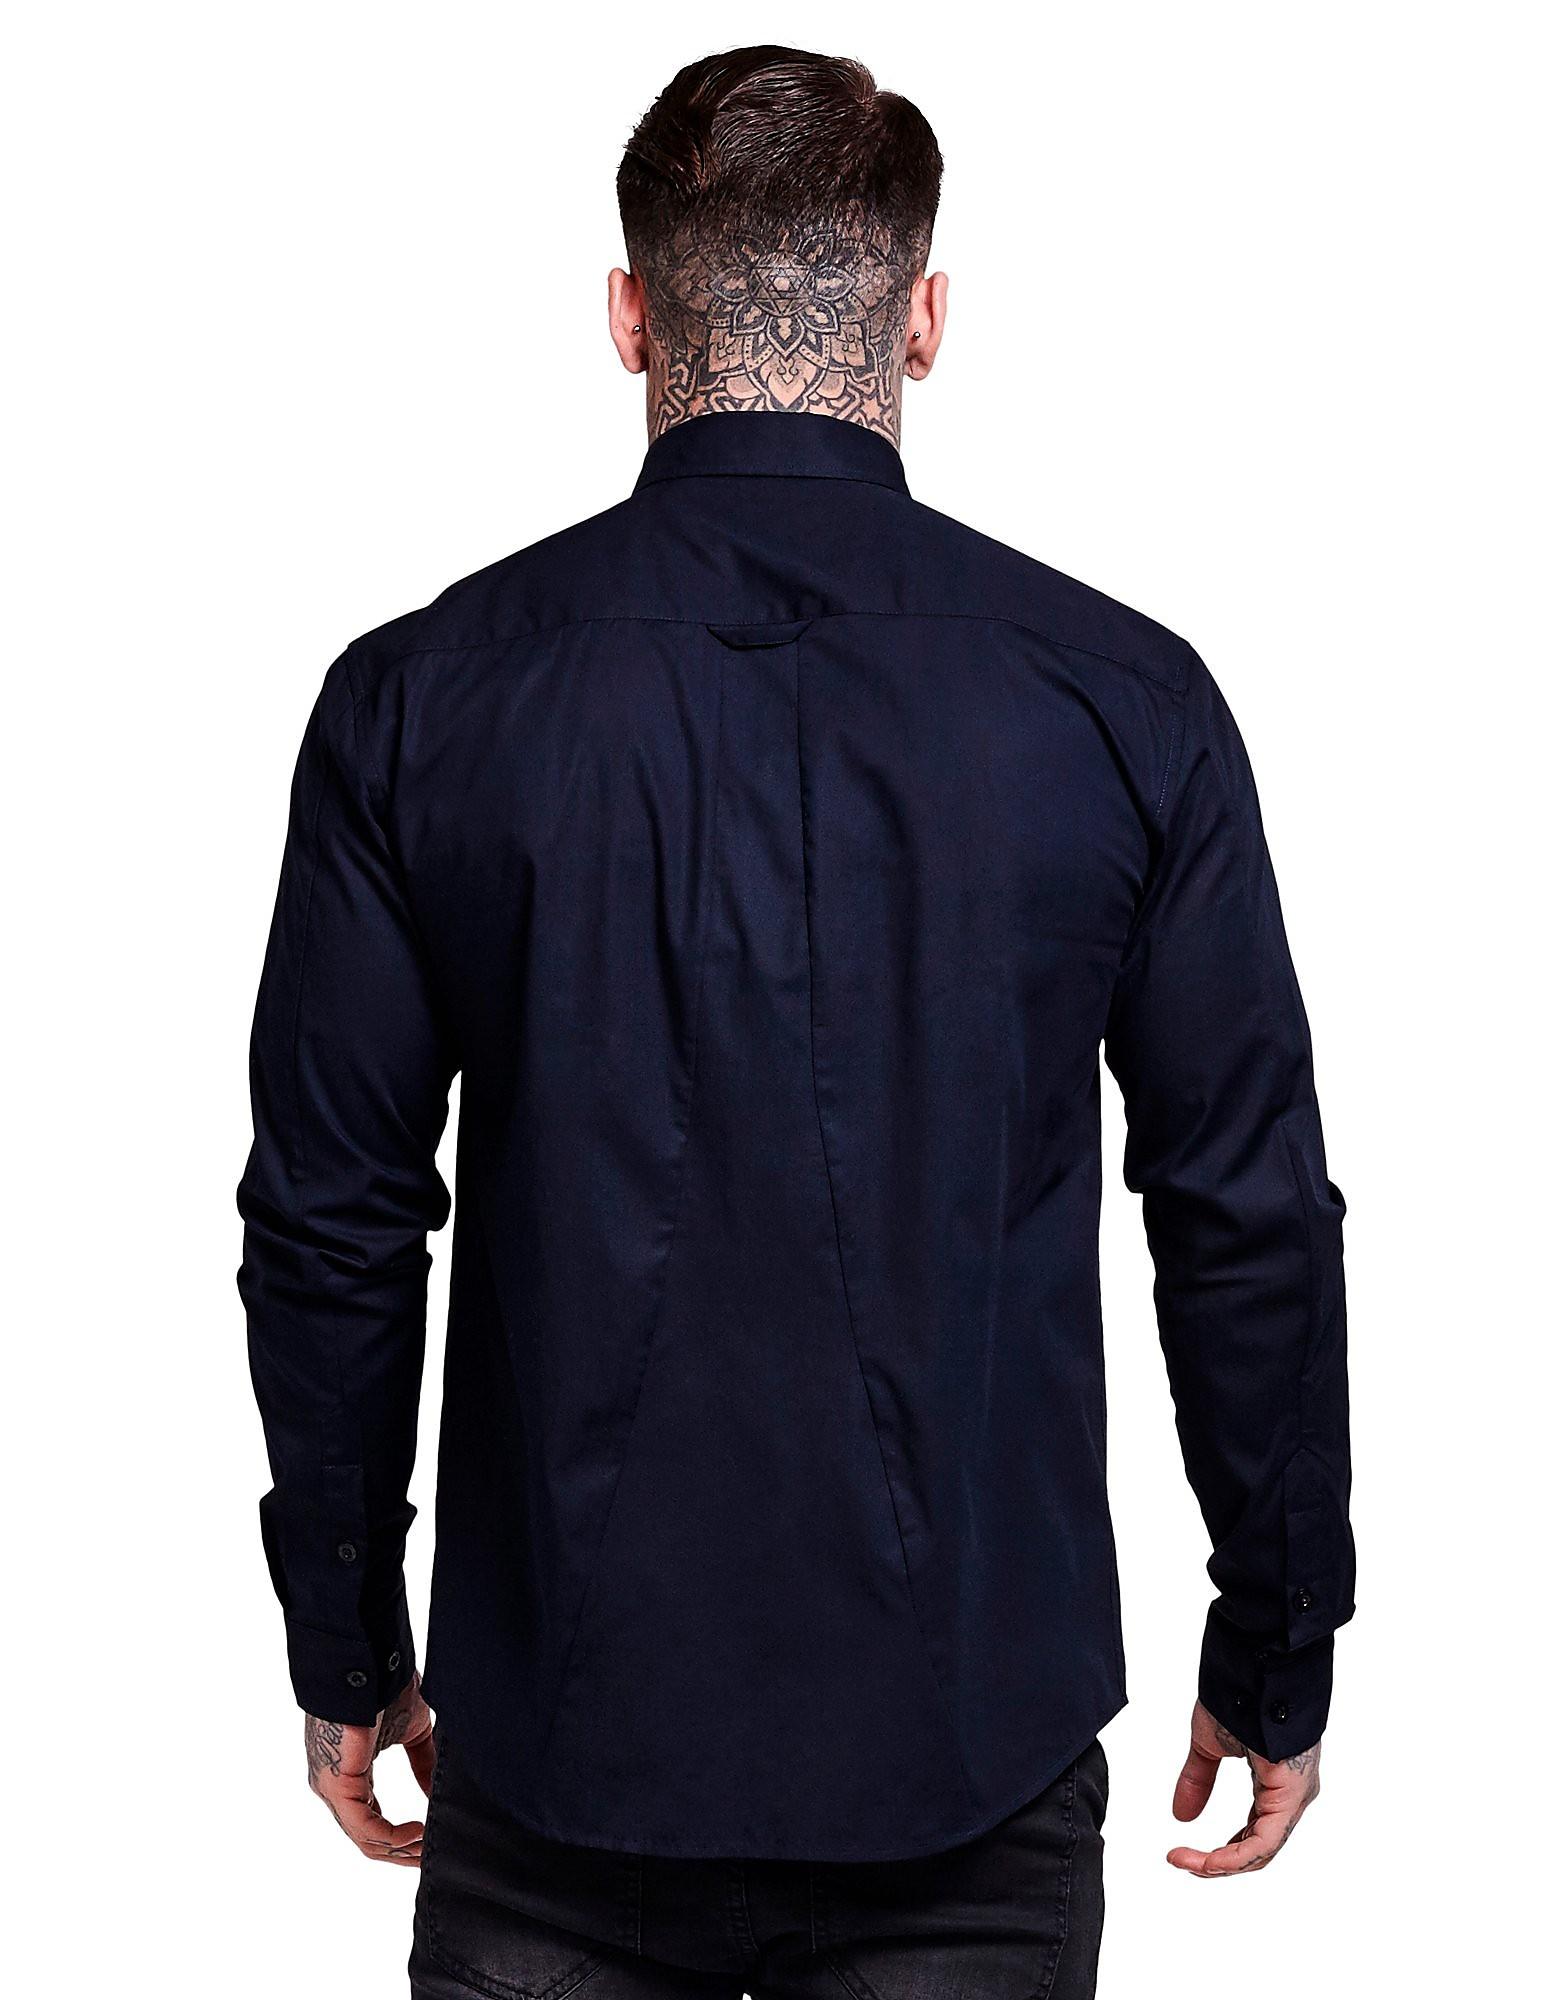 SikSilk Long Sleeve Stretch Shirt